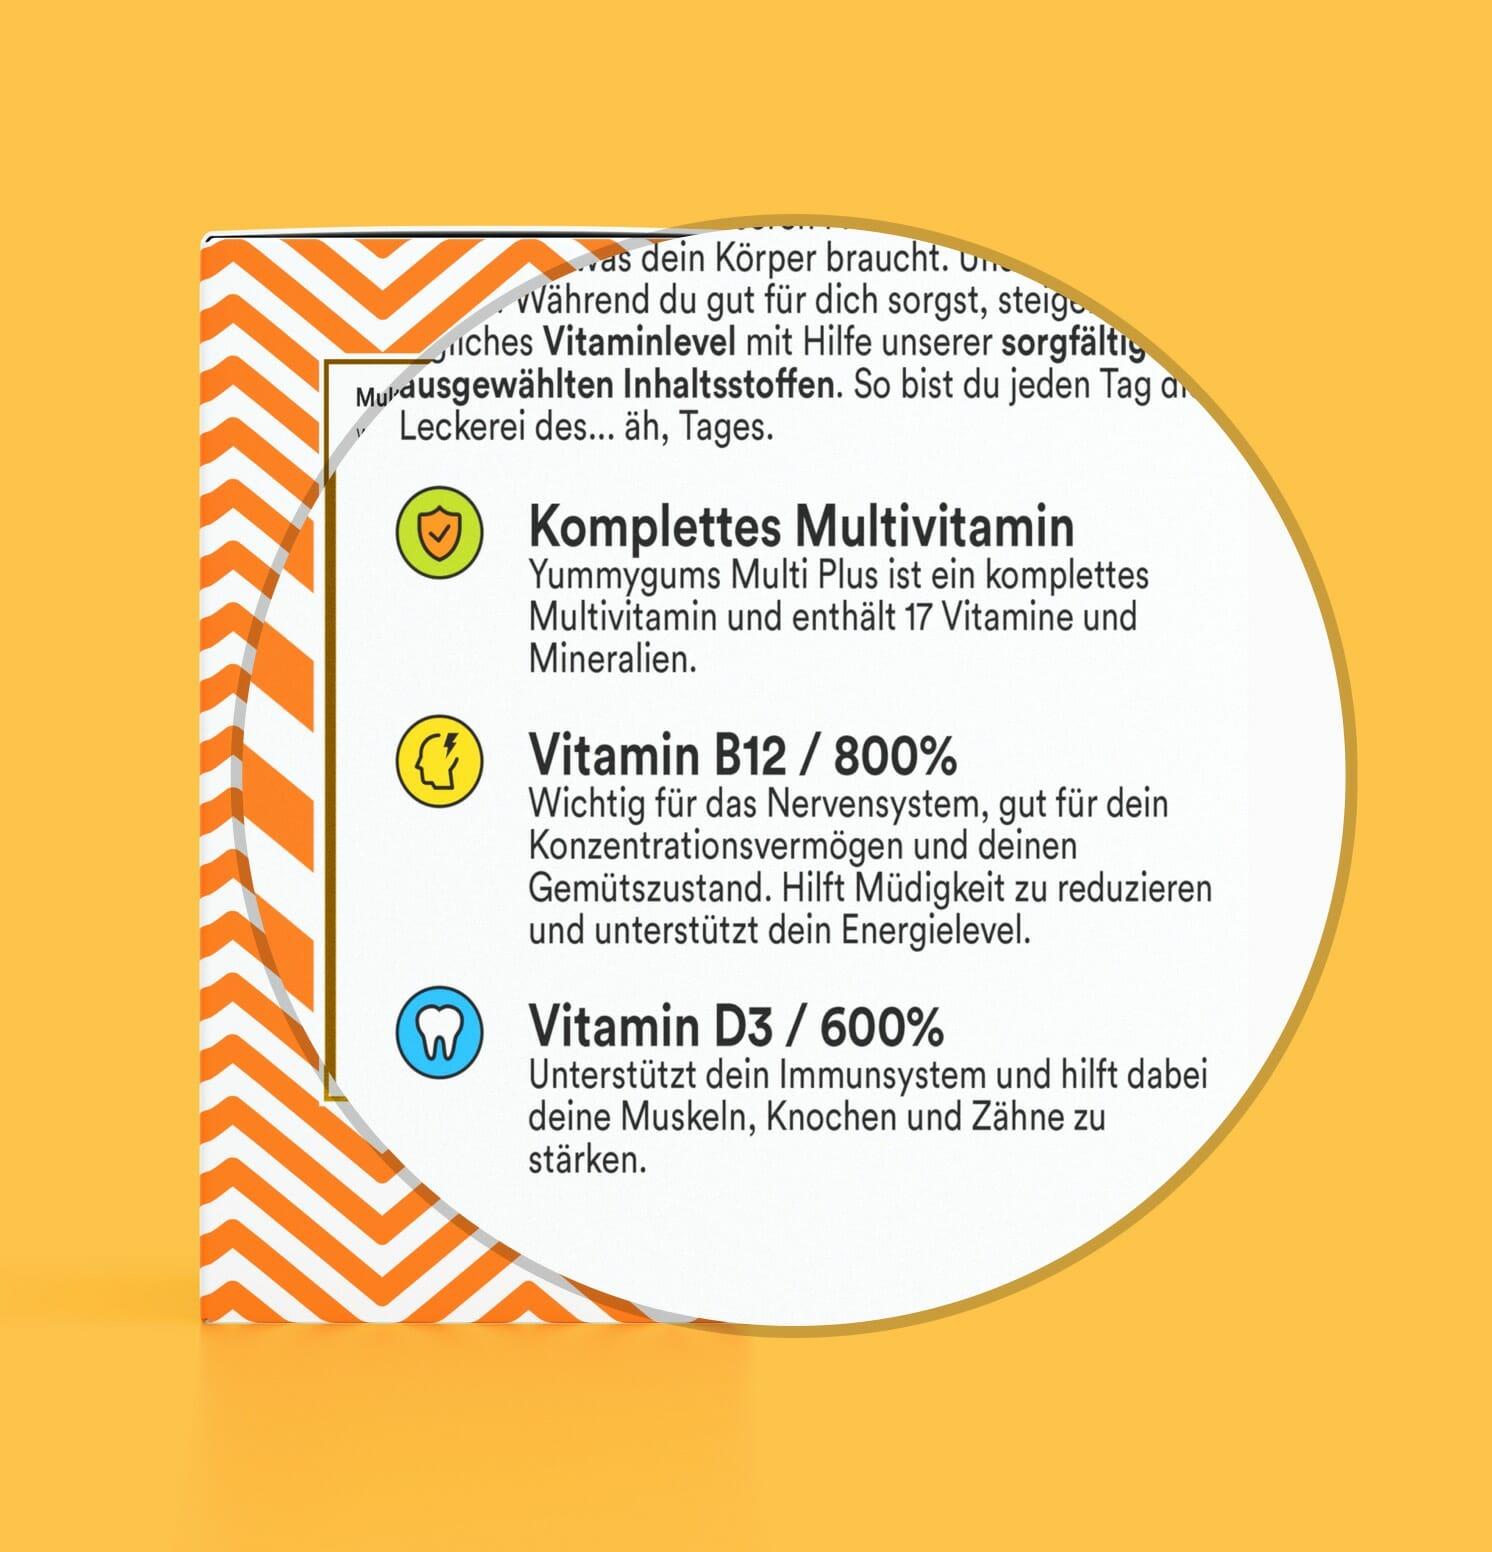 Bestes Multivitamin - Gutes Multivitamin - Multivitamin Kind - Vitamin B12 - Yummygums